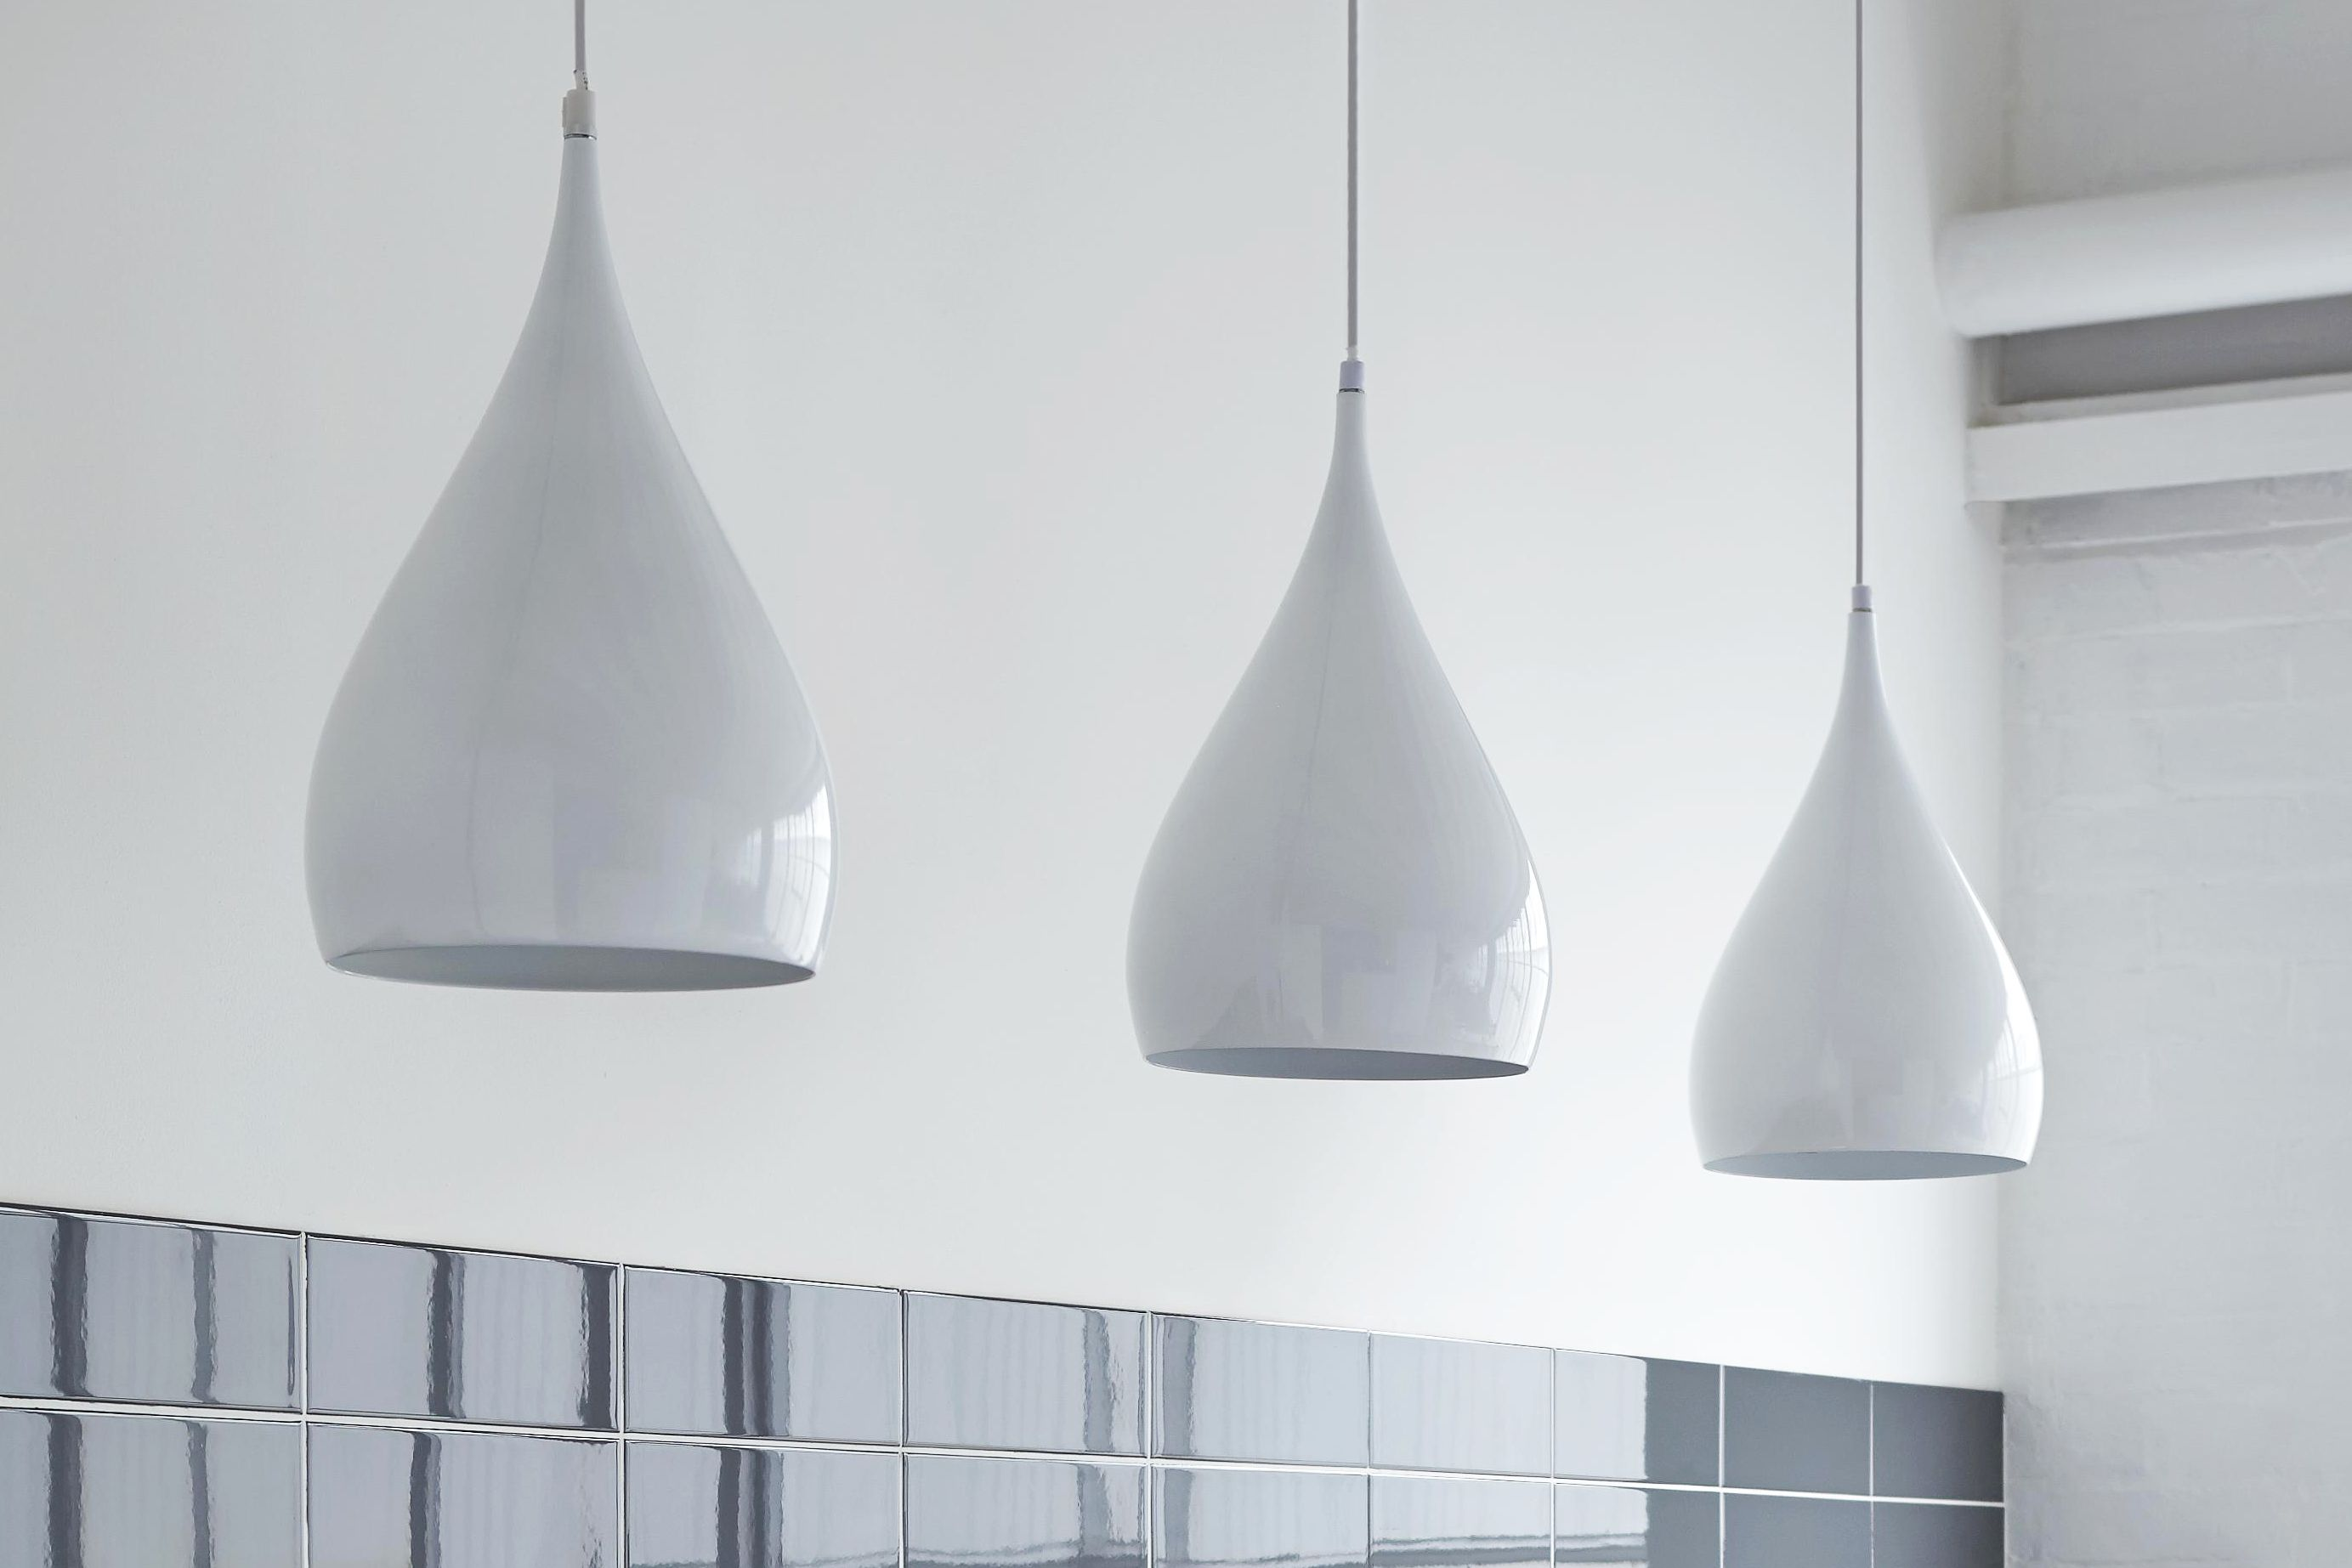 Bathroom Light Fixtures B&Q bathroom lights | bathroom wall & ceiling lights | diy at b&q